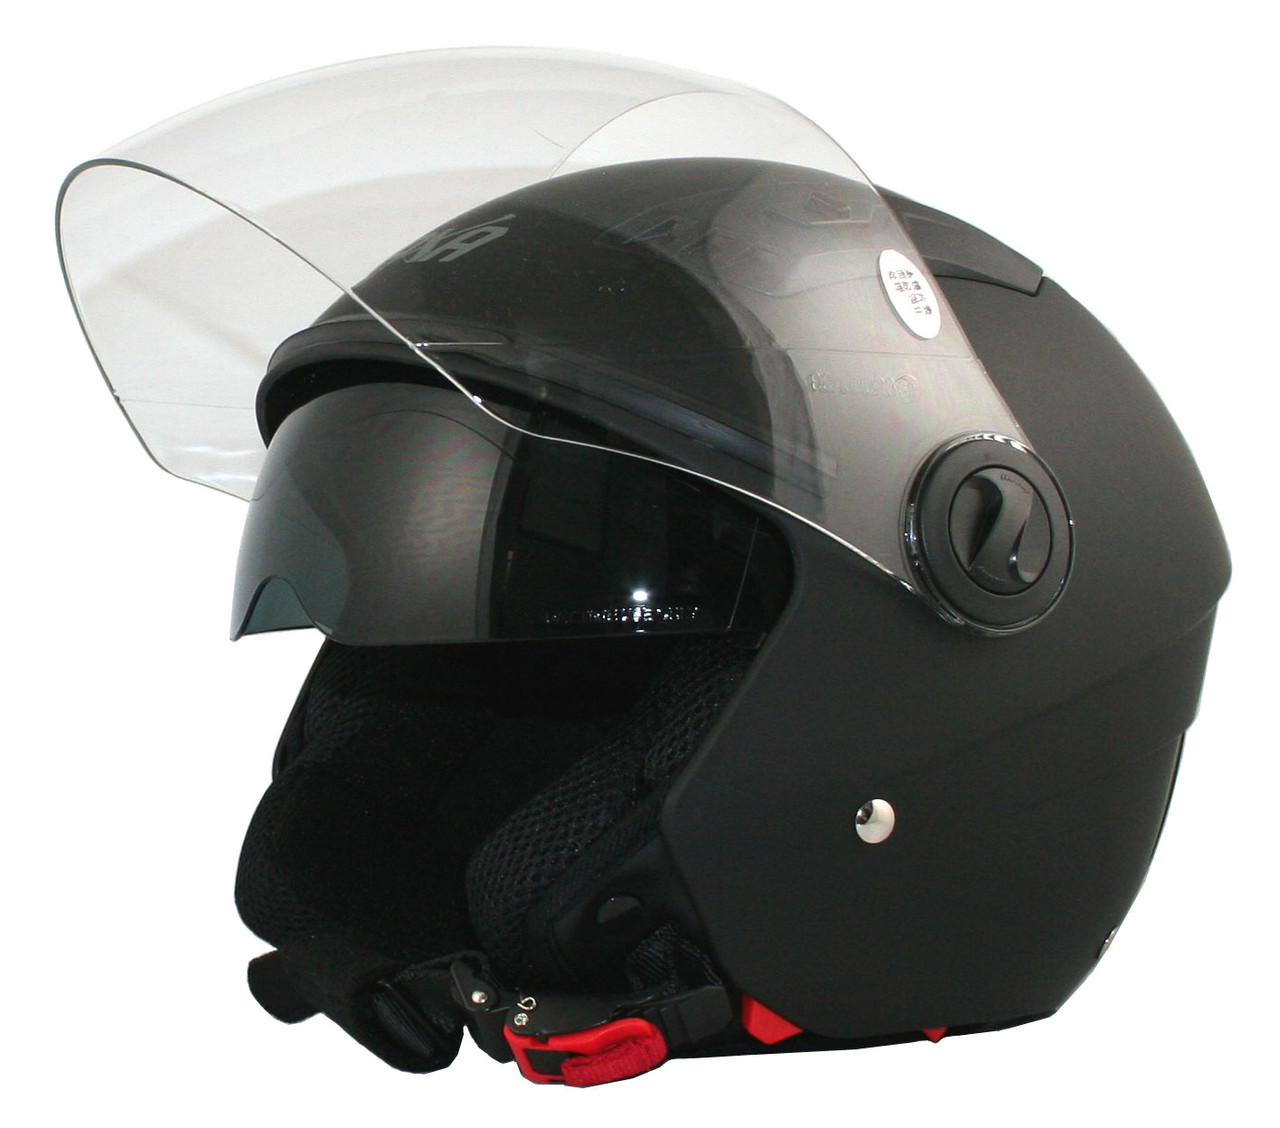 Мотоциклетный шлем NAXA S16B rXL+BLENDA